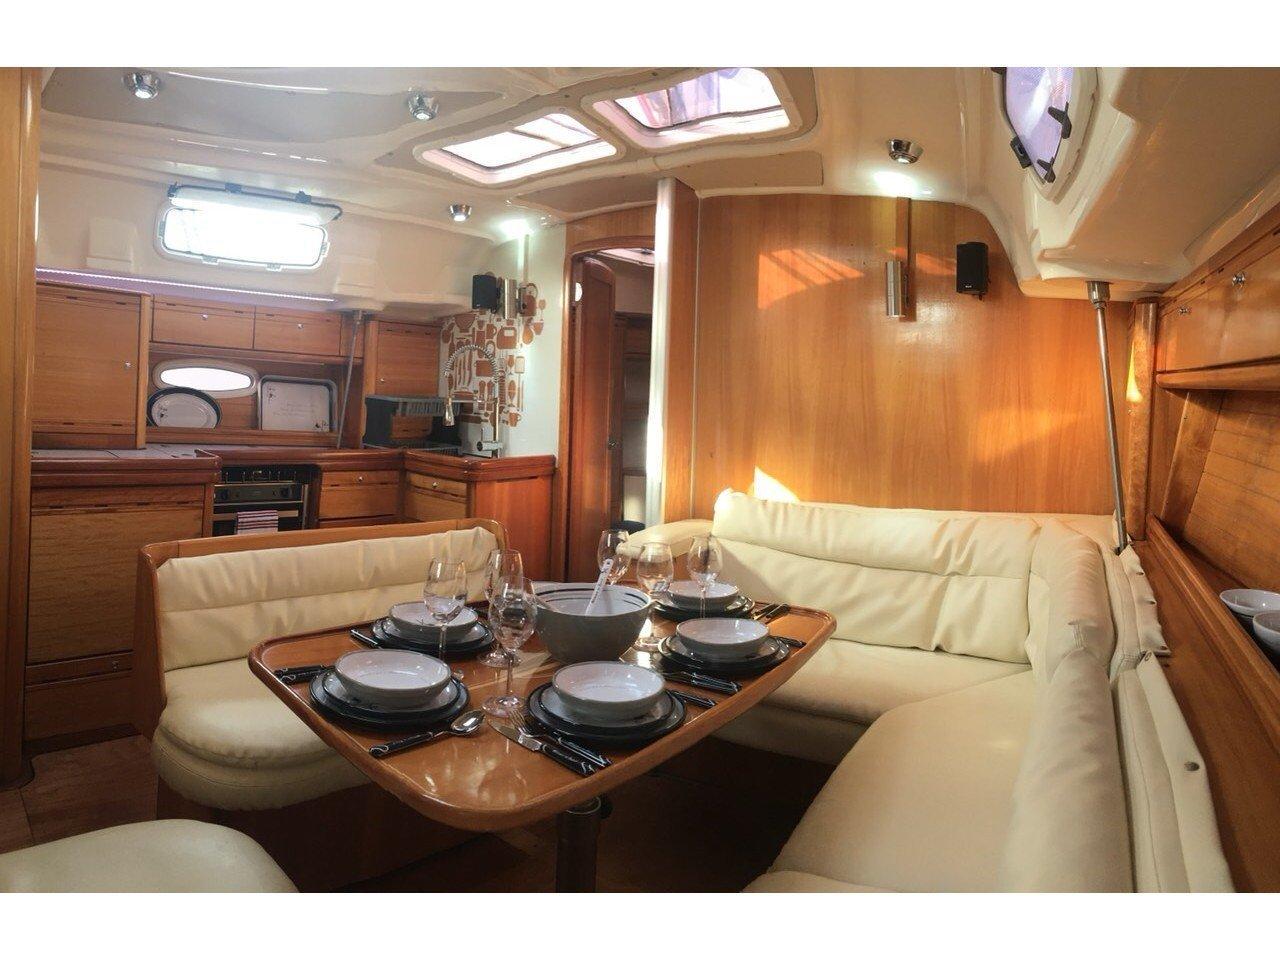 Bavaria 42 Cruiser (Serenity) Interior image - 9